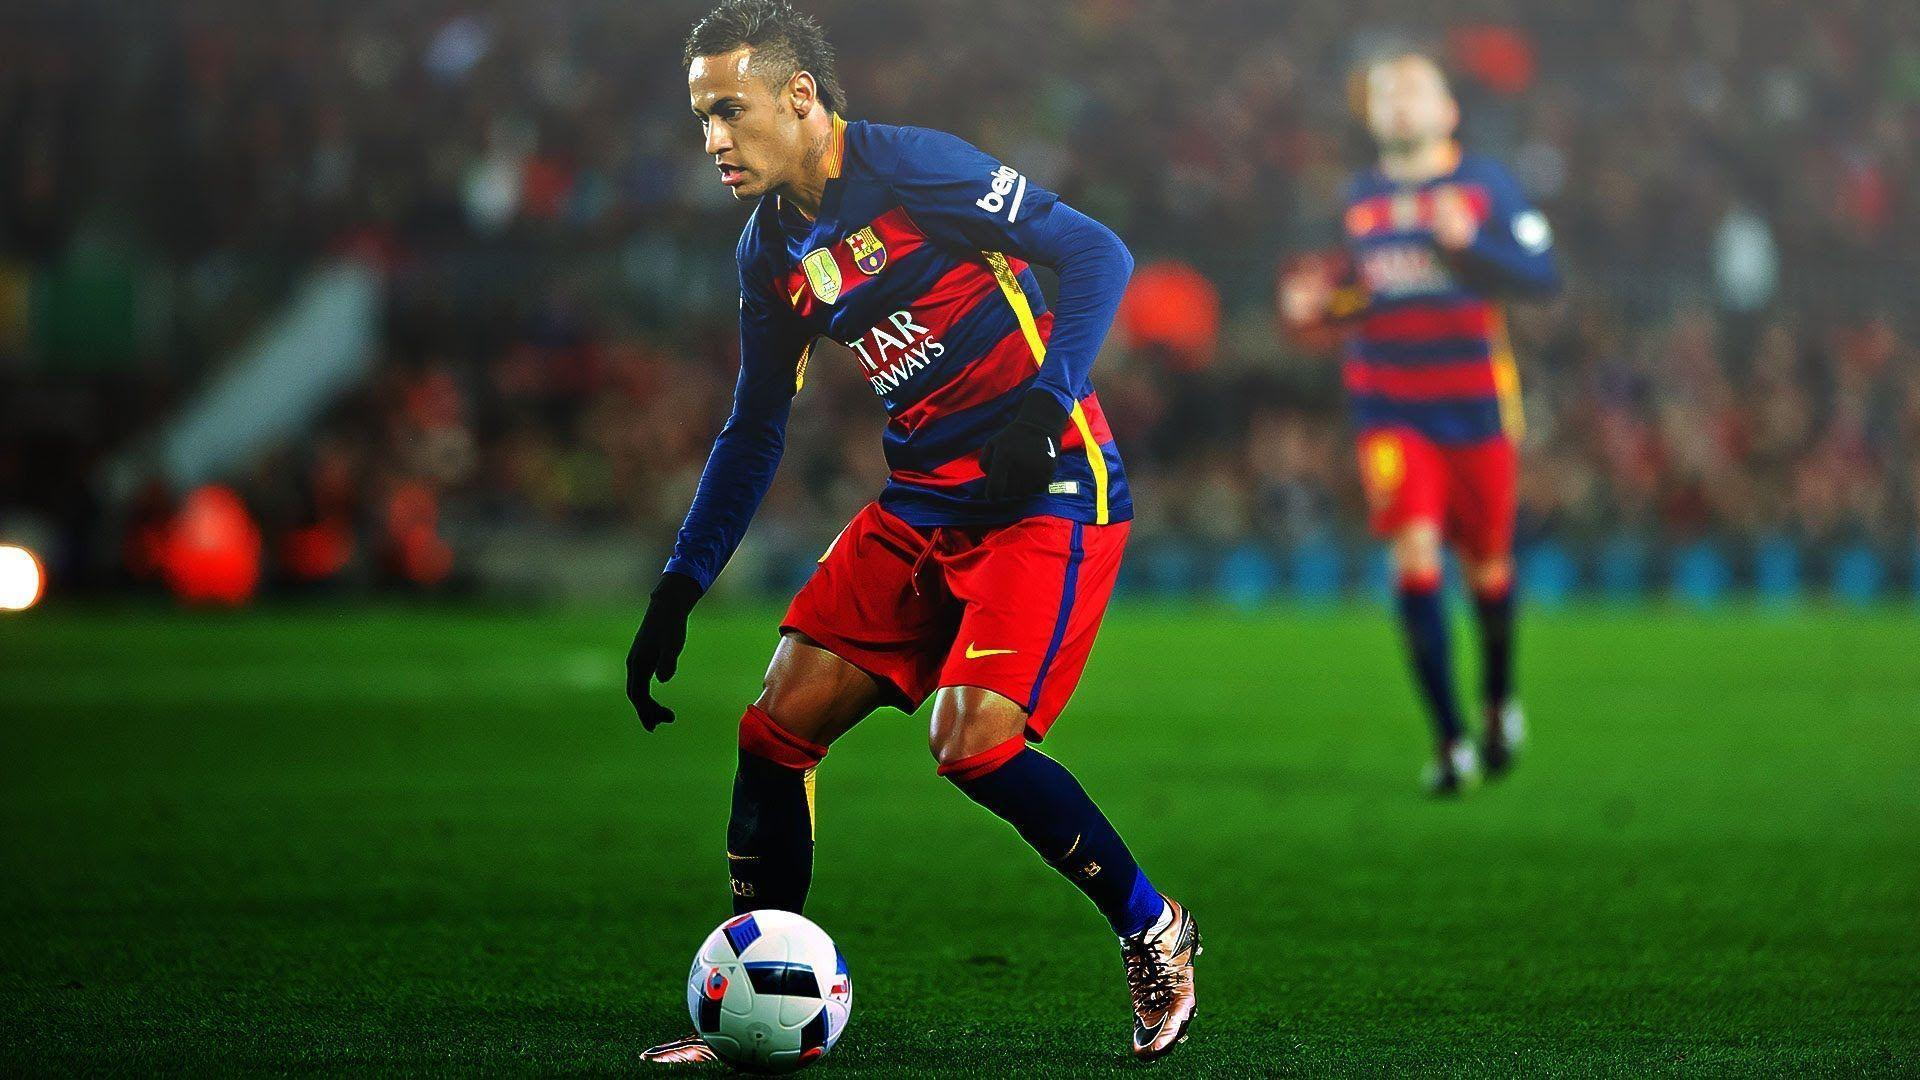 Neymar Jr Wallpapers 2017 Wallpaper Cave